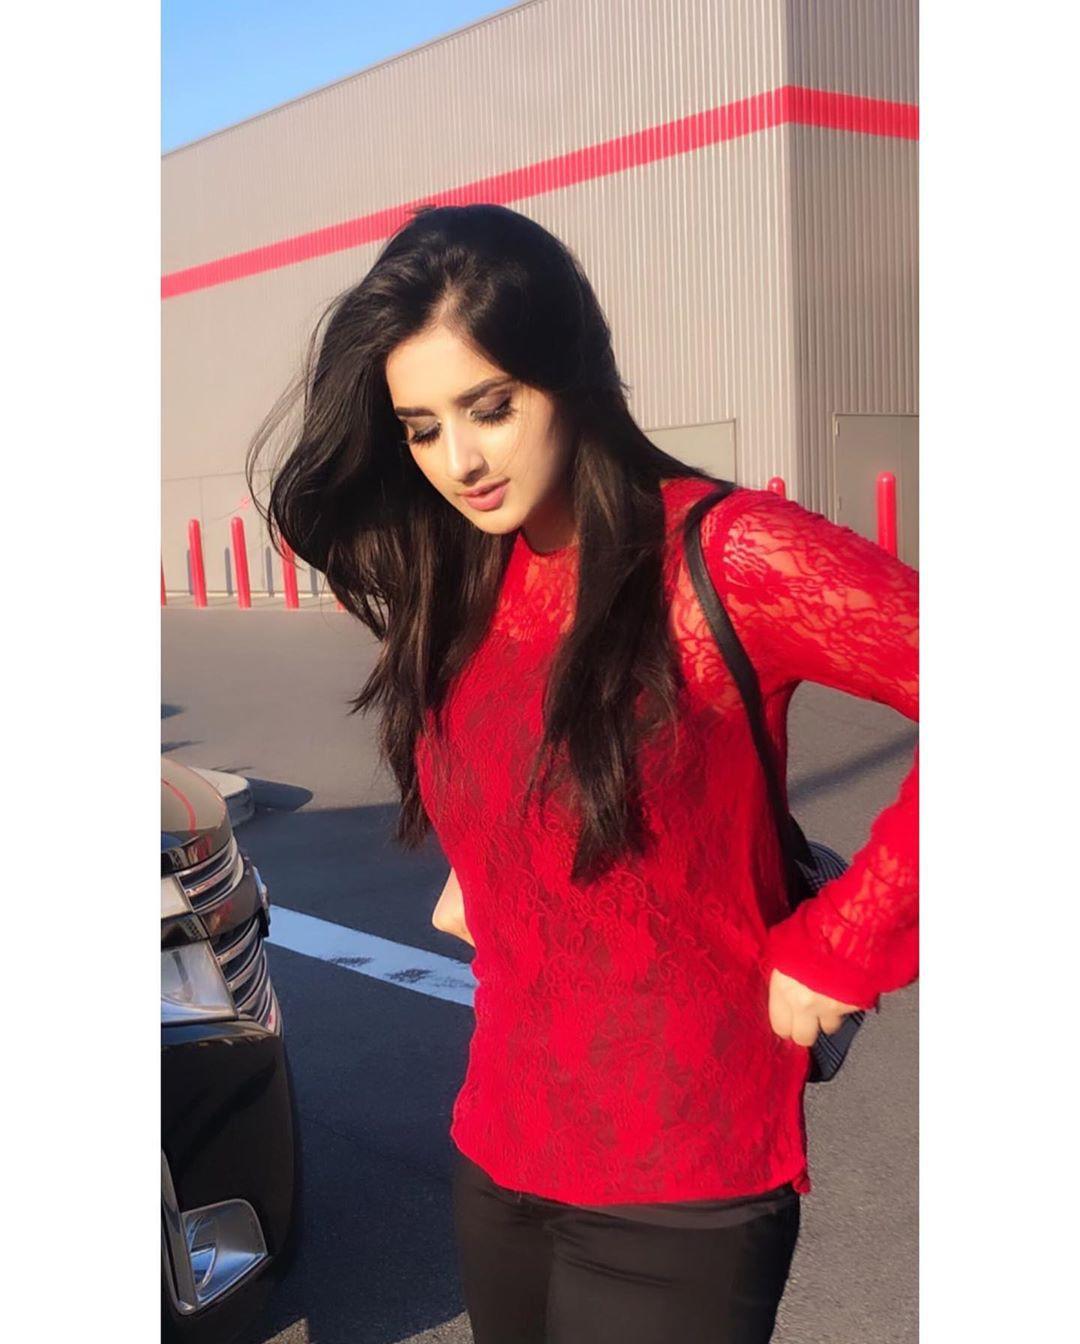 Alishbah Anjum t-shirt, tights colour outfit ideas 2020, Long Hair Ideas